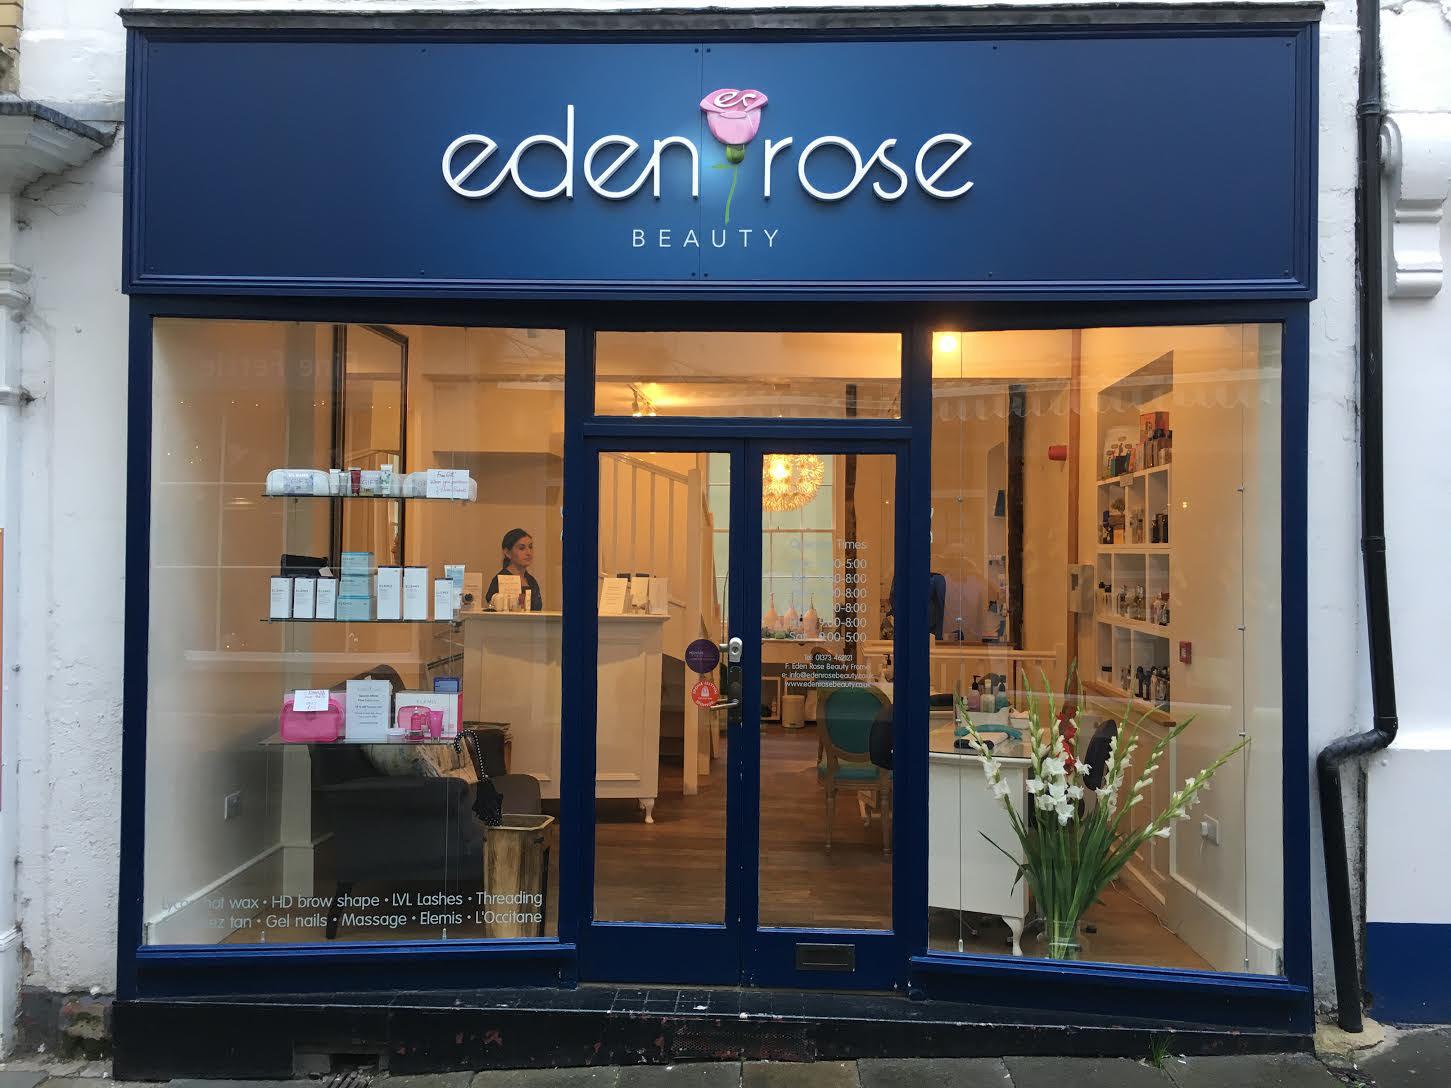 eden rose beauty discover frome. Black Bedroom Furniture Sets. Home Design Ideas